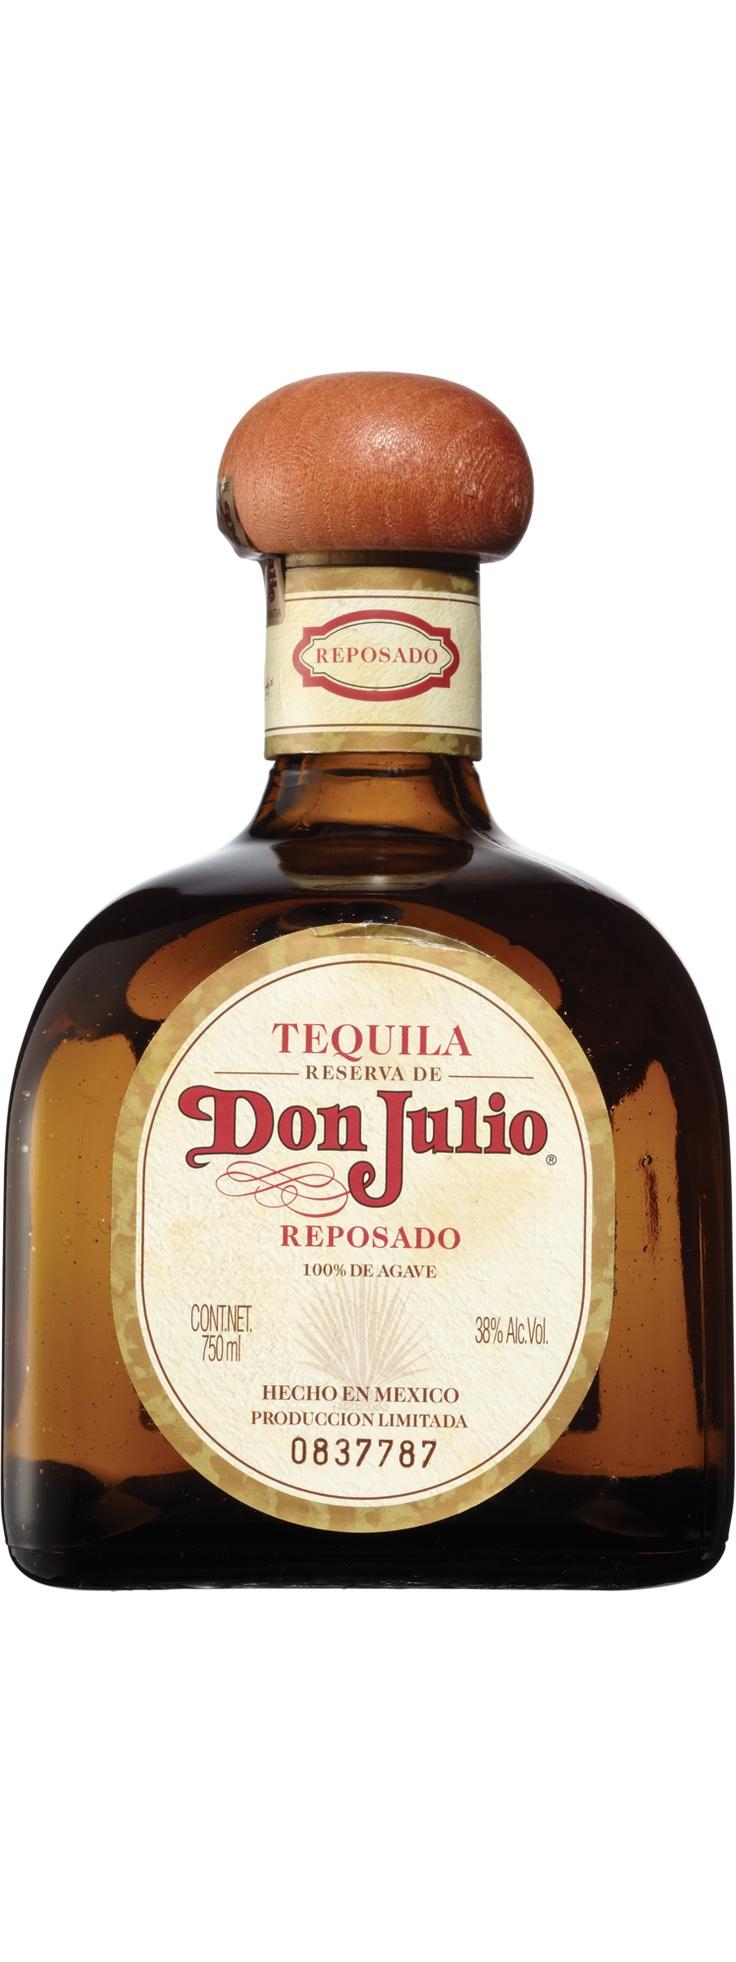 Don julio reposado tequila med bilder